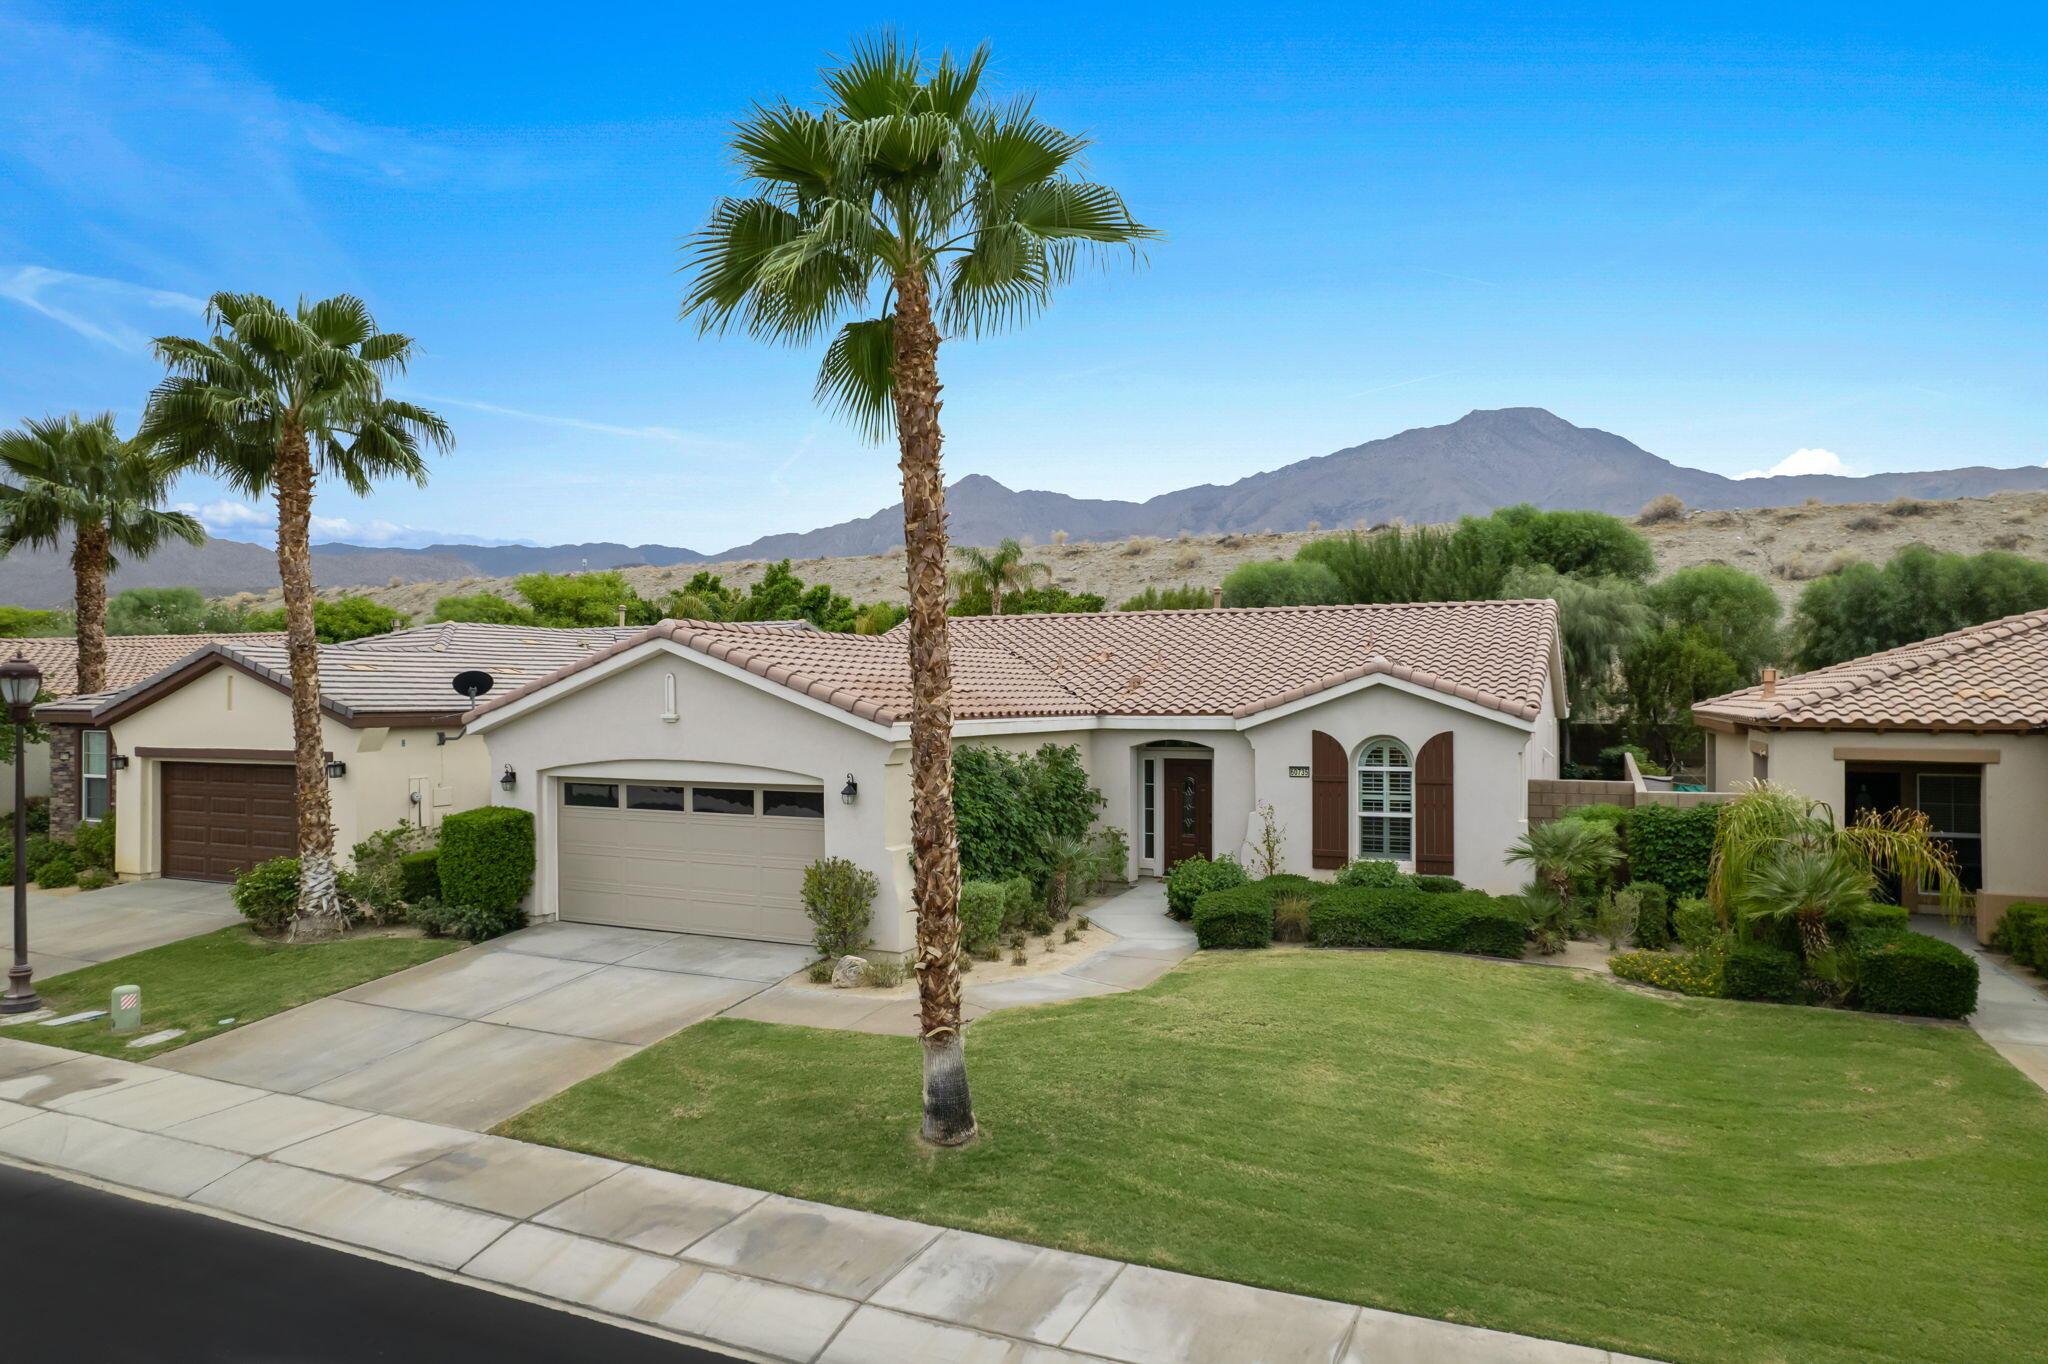 Photo of 60735 Living Stone Drive, La Quinta, CA 92253